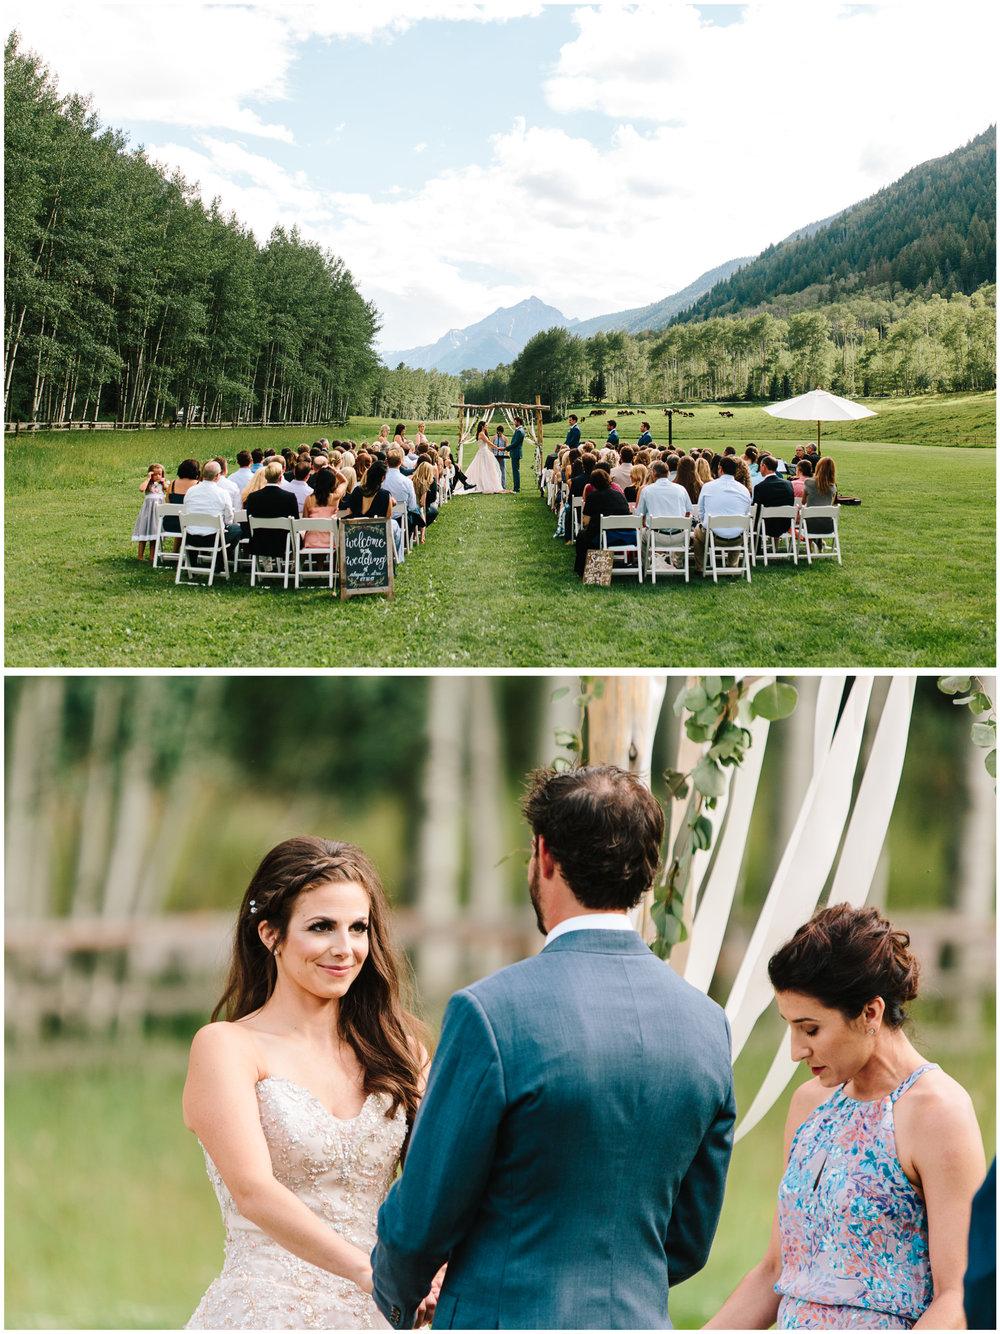 aspen_wedding_37.jpg